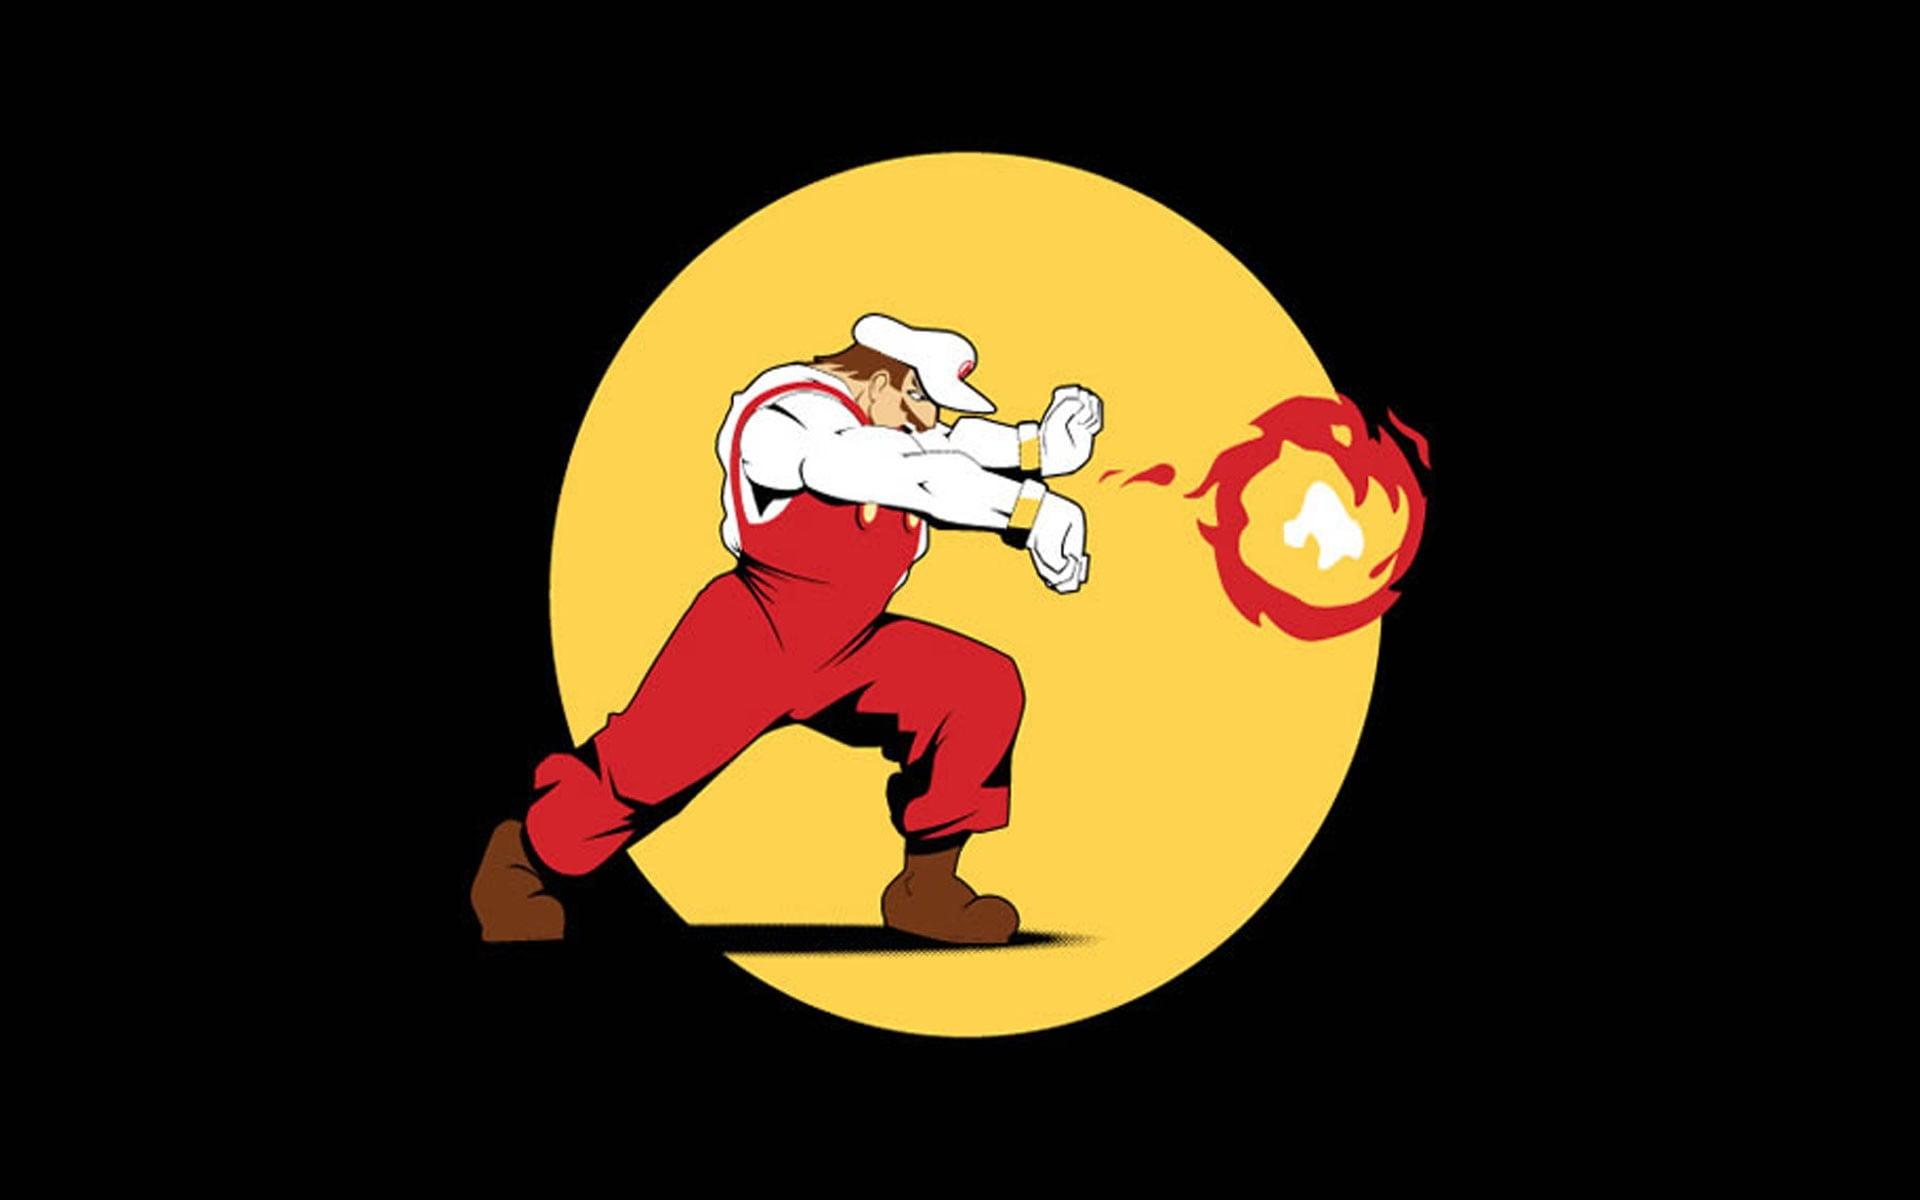 Super Mario illustration video games Super Mario fireballs 1920x1200